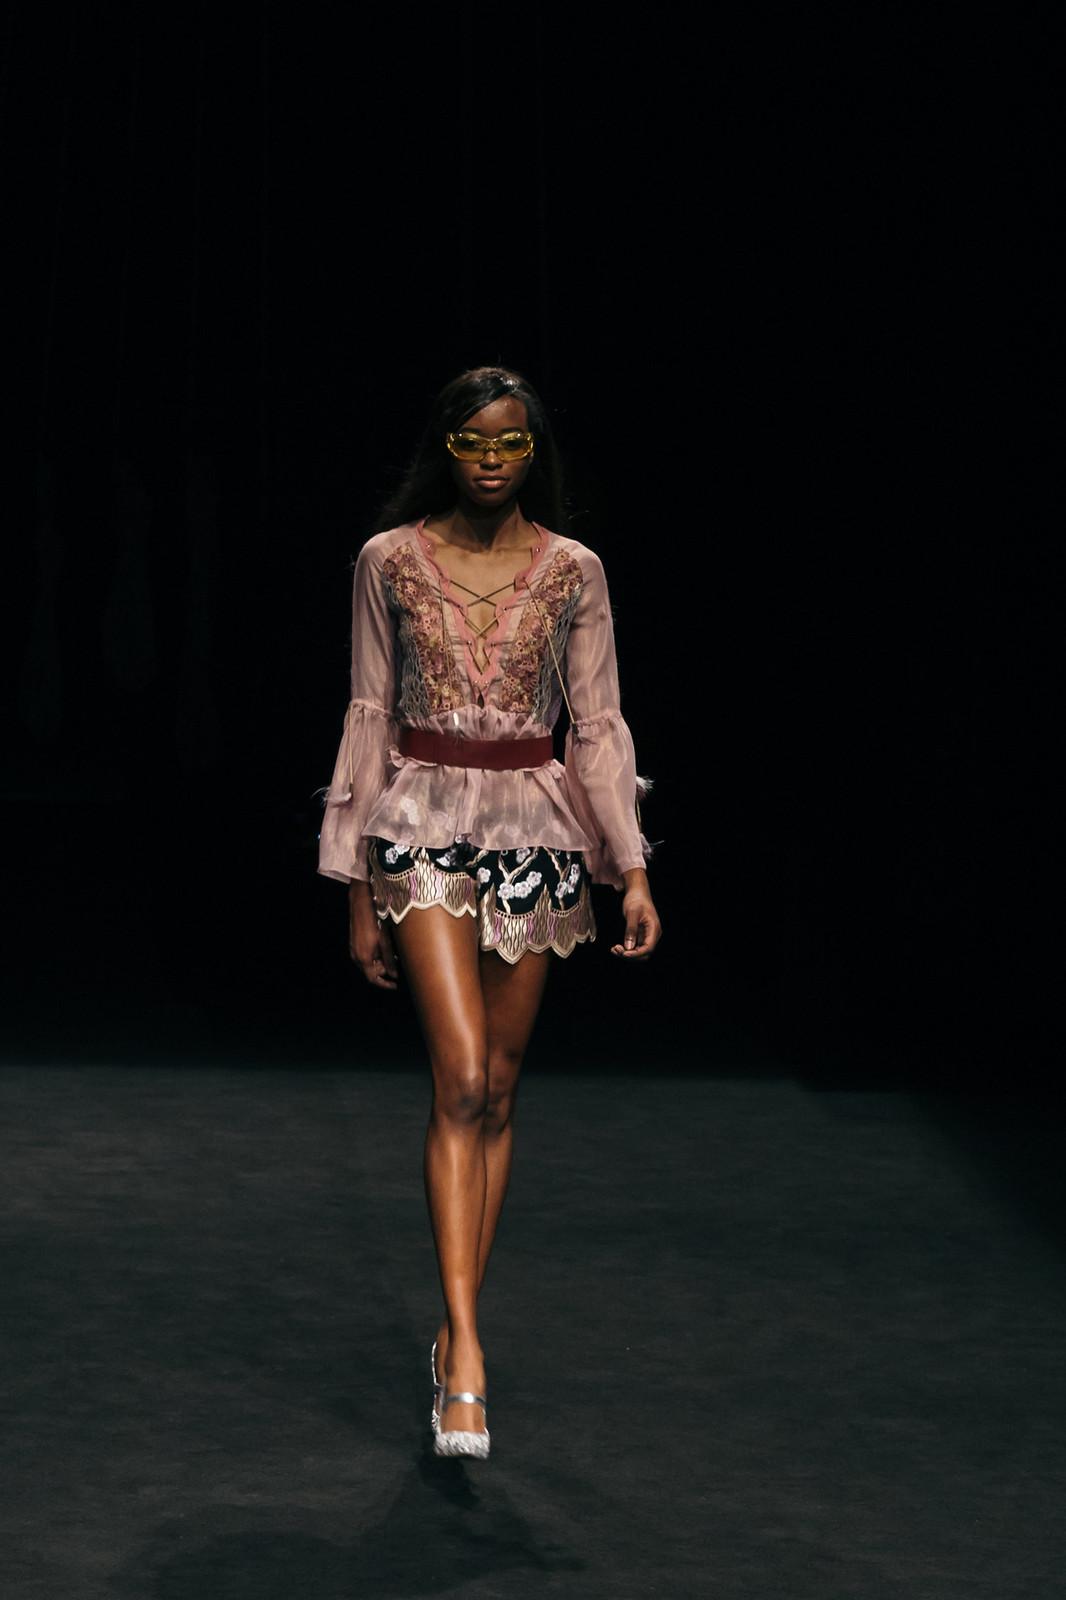 Jessie Chanes - Seams for a desire - 080 Bacelona Fashion #080bcnfasion -3